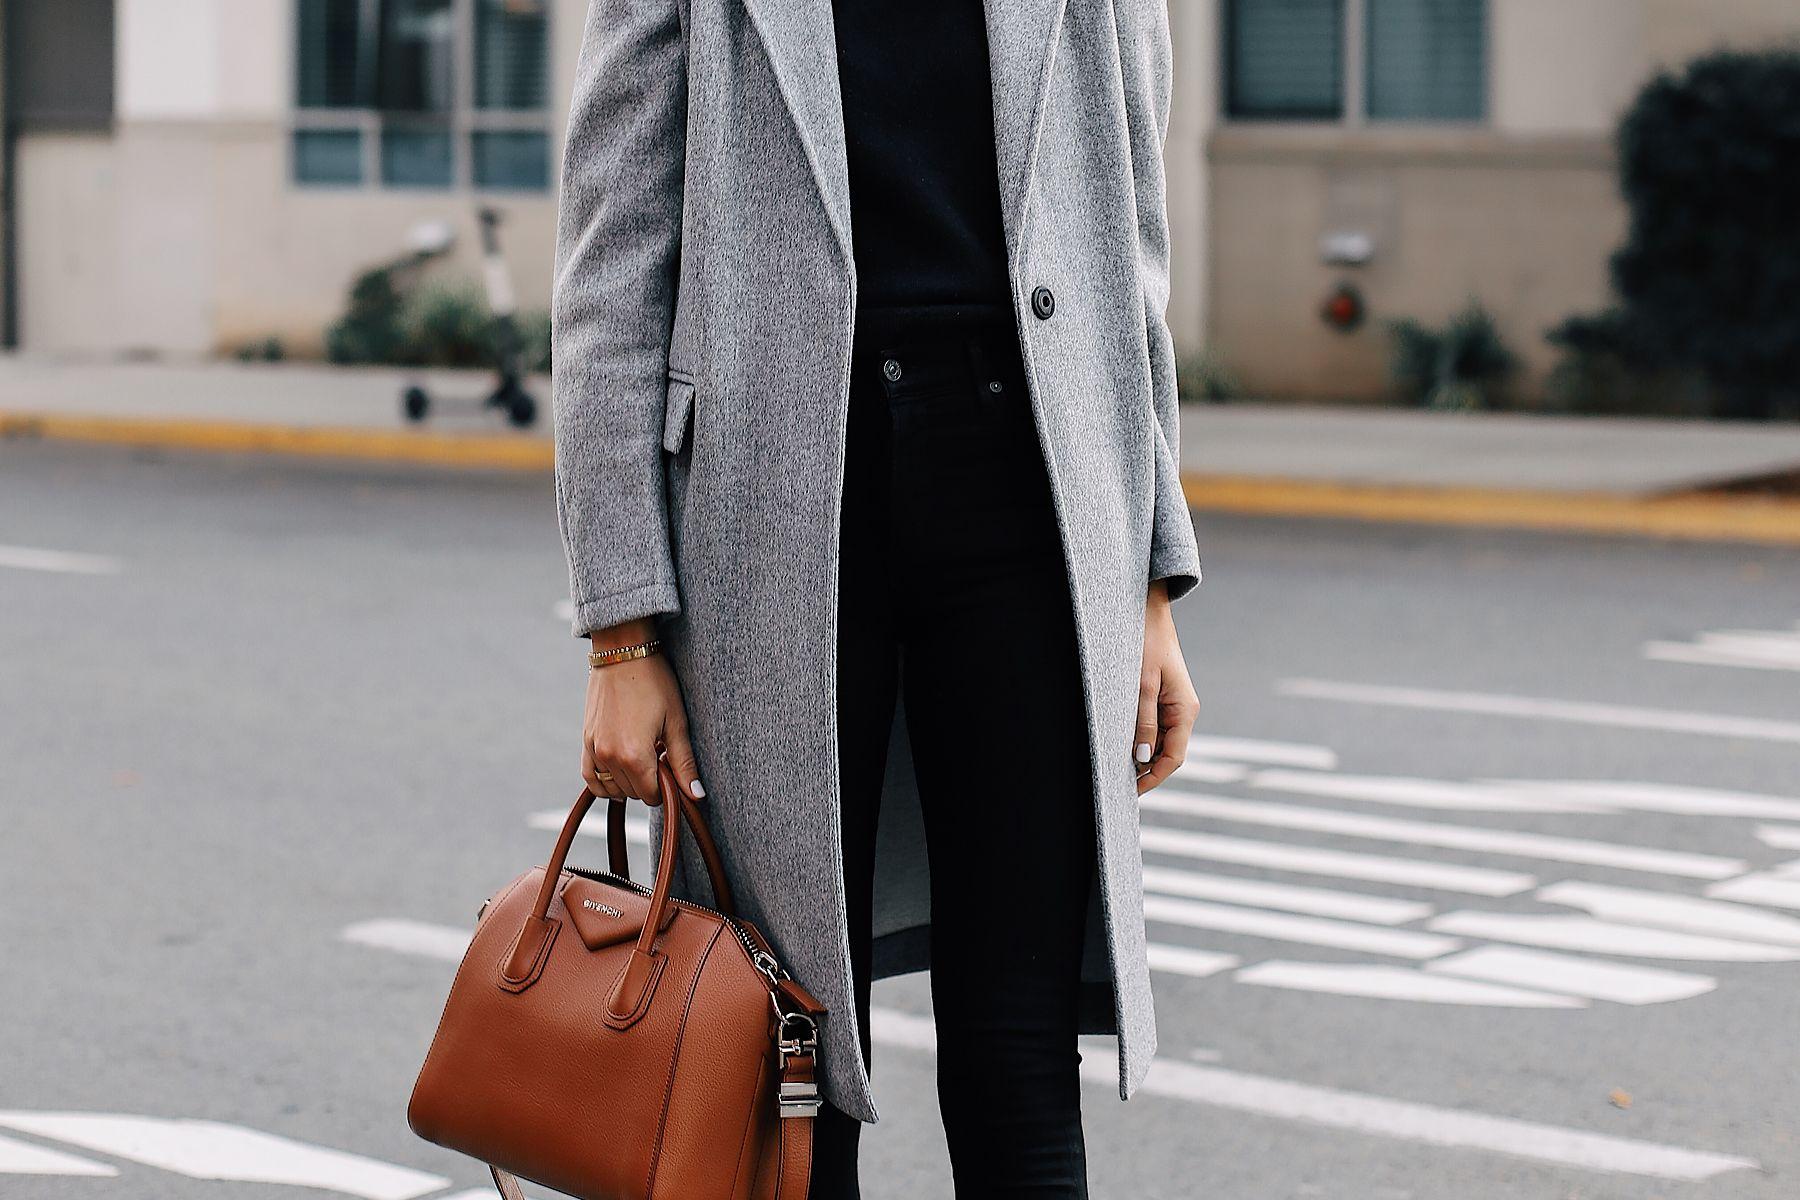 c664885311d7 Woman Wearing Topshop Grey Coat Black Skinny Jeans Givenchy Antigona Cognac  Handbag Fashion Jackson San Diego Fashion Blogger Street Style